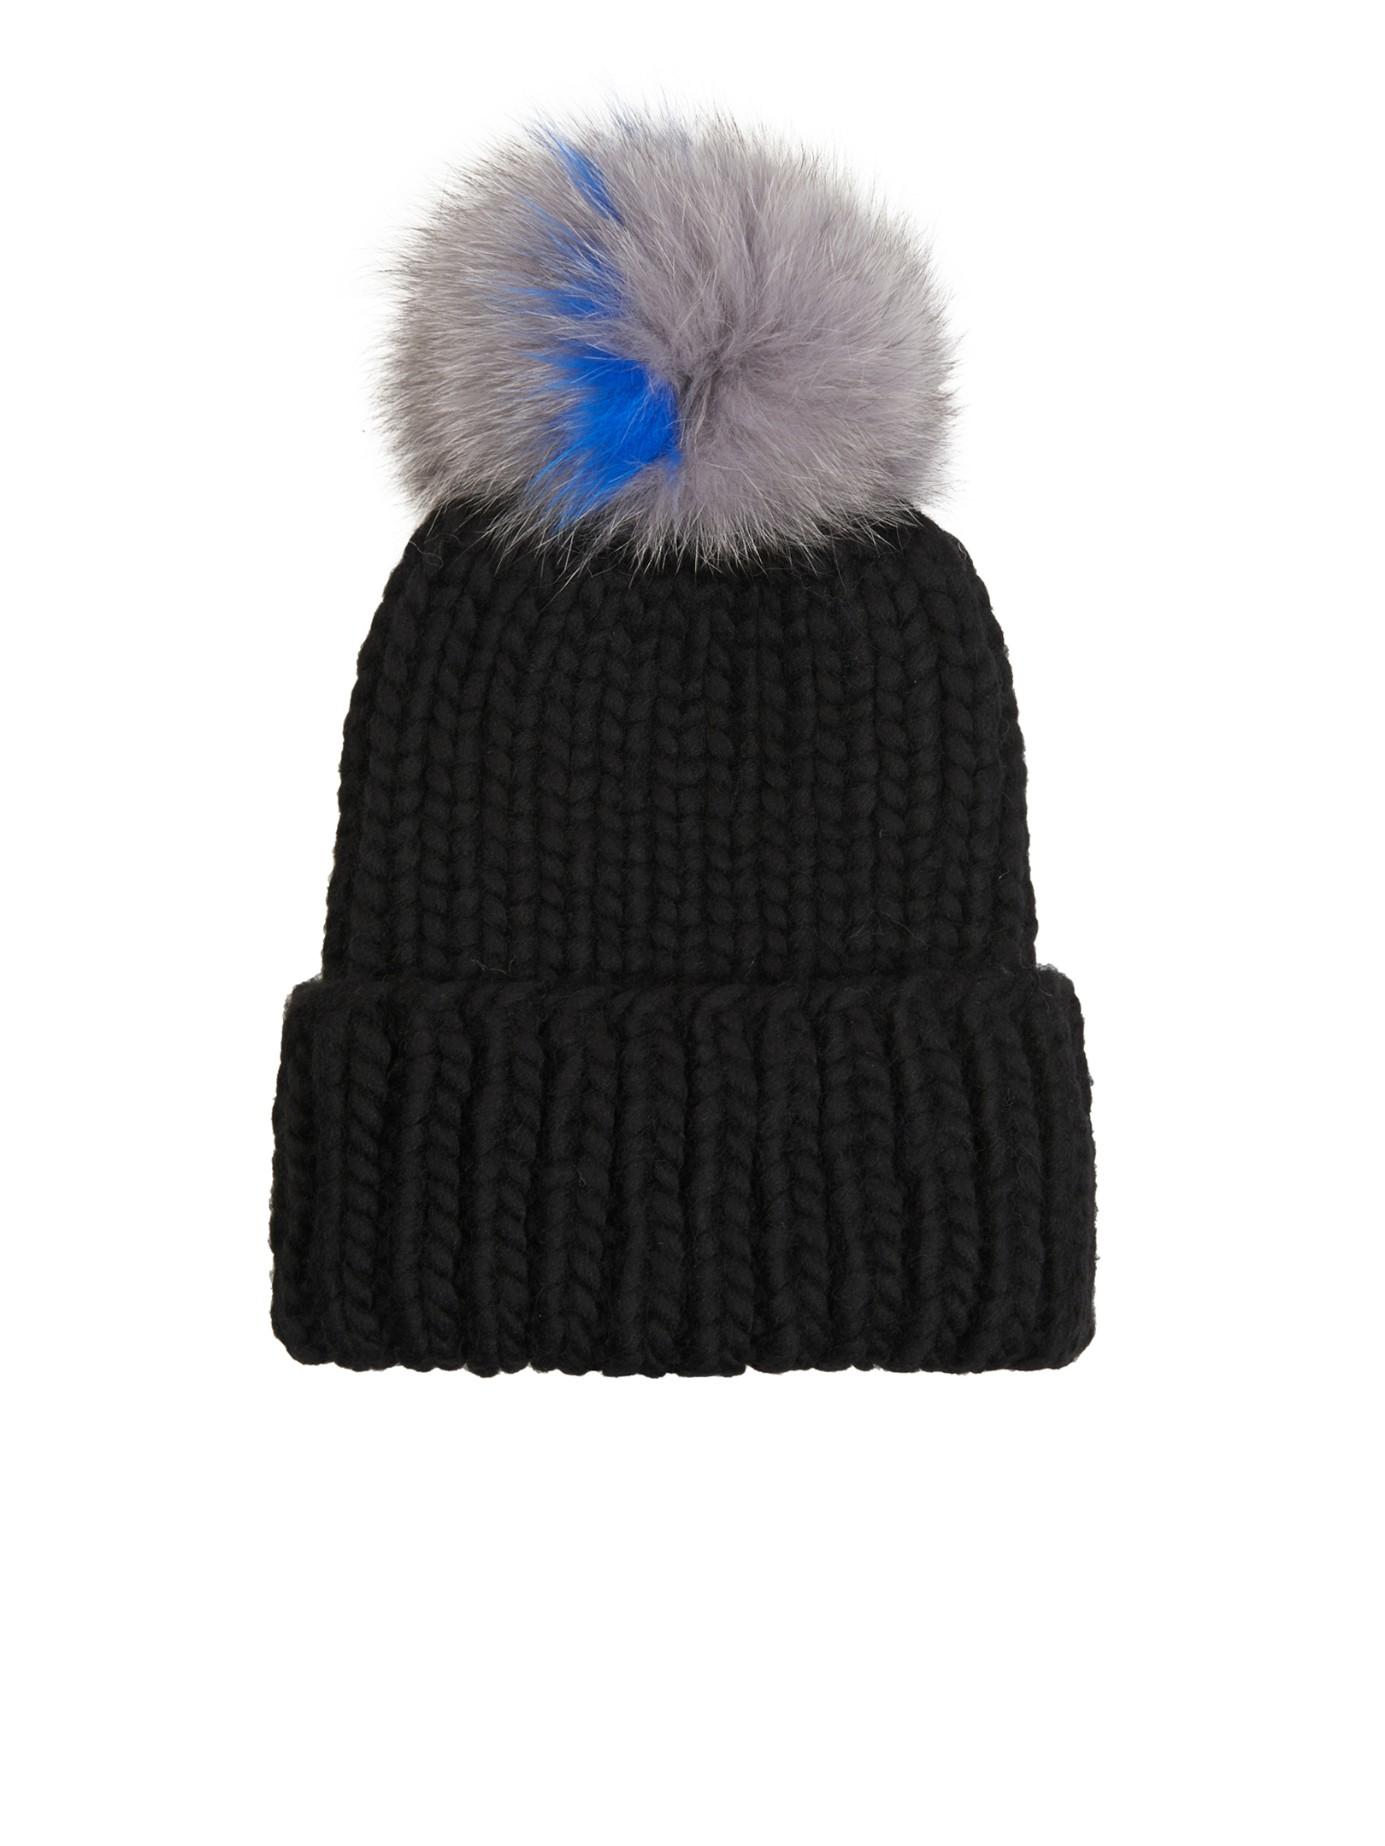 833d64bc6c6 Eugenia Kim Rain Fur Pompom Beanie Hat in Black - Lyst